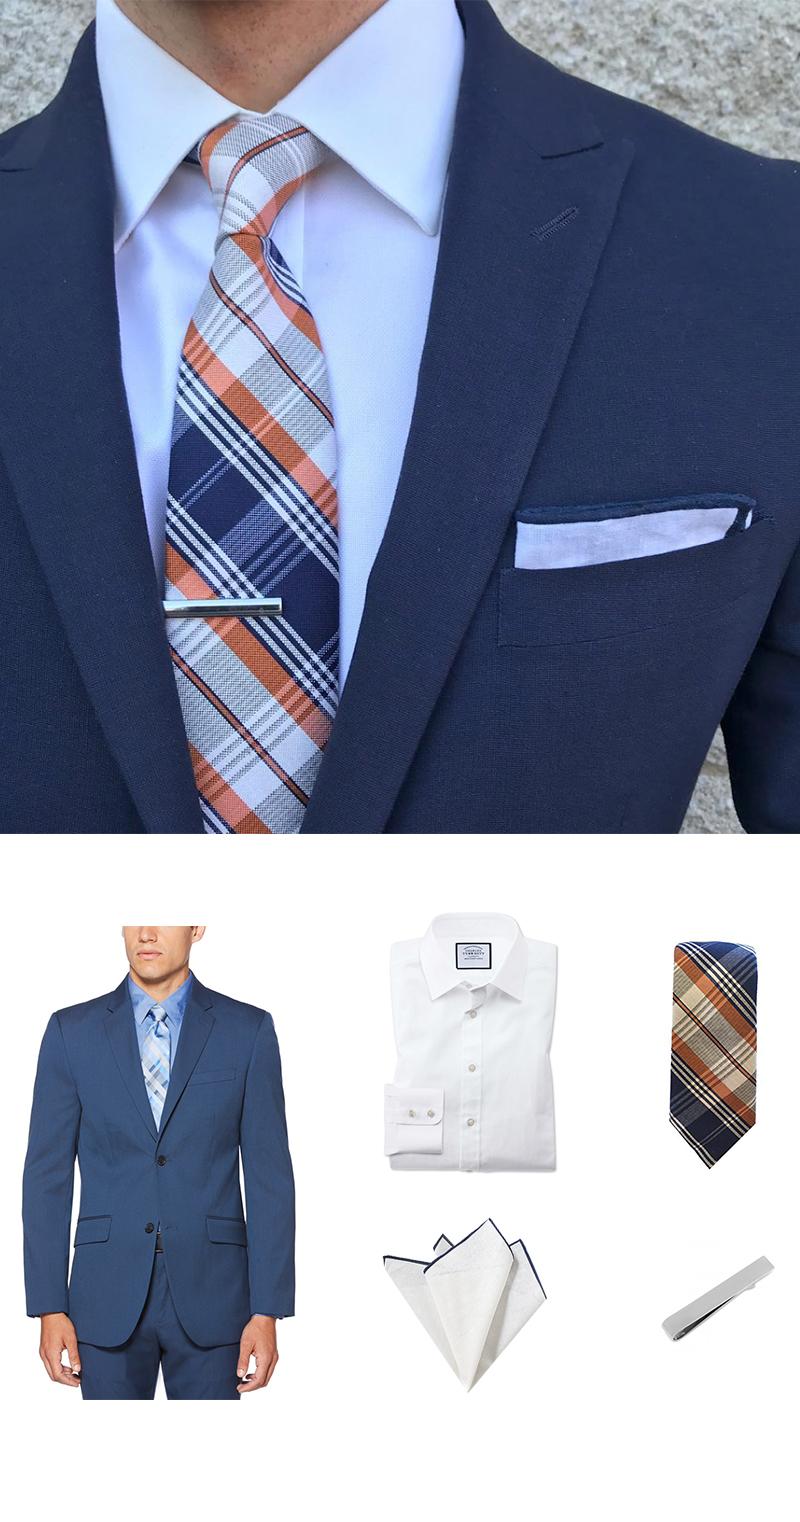 Plaid Trends In Menswear